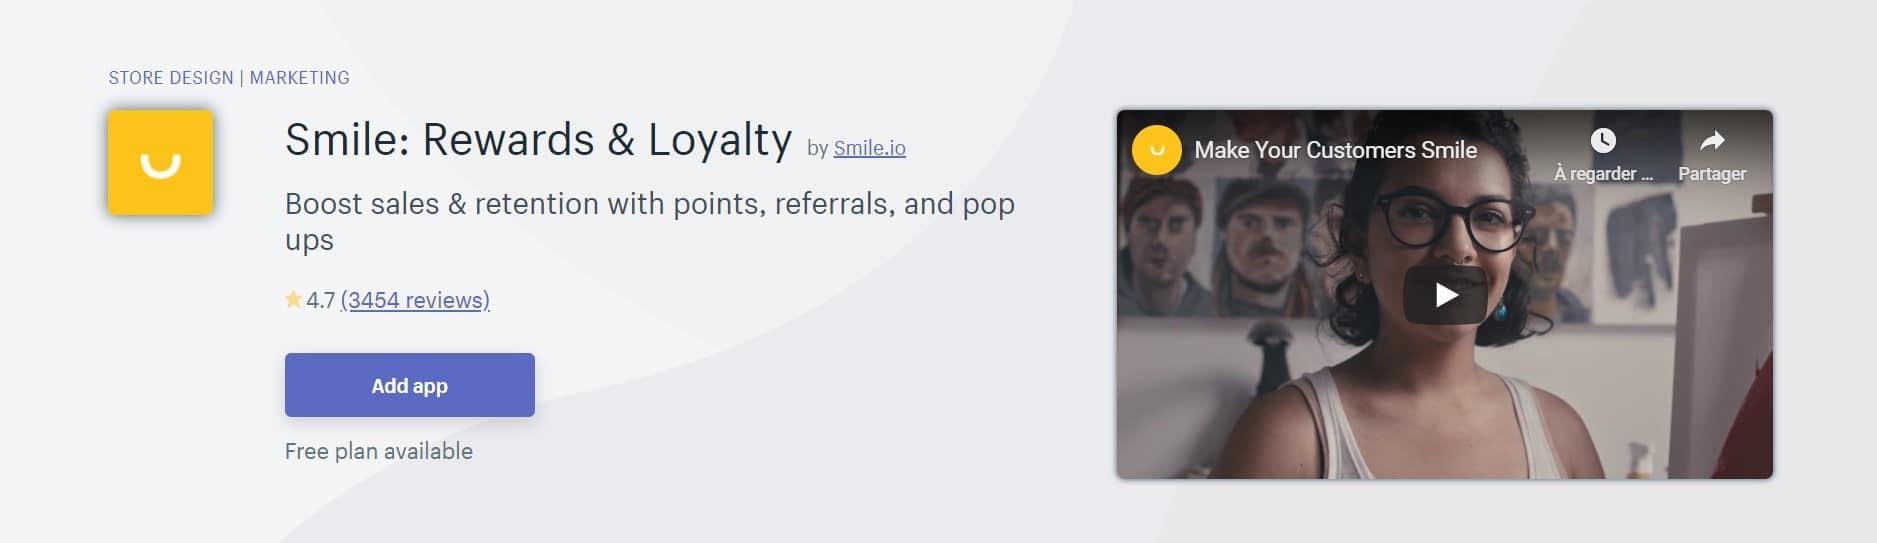 Application Shopify: Smile